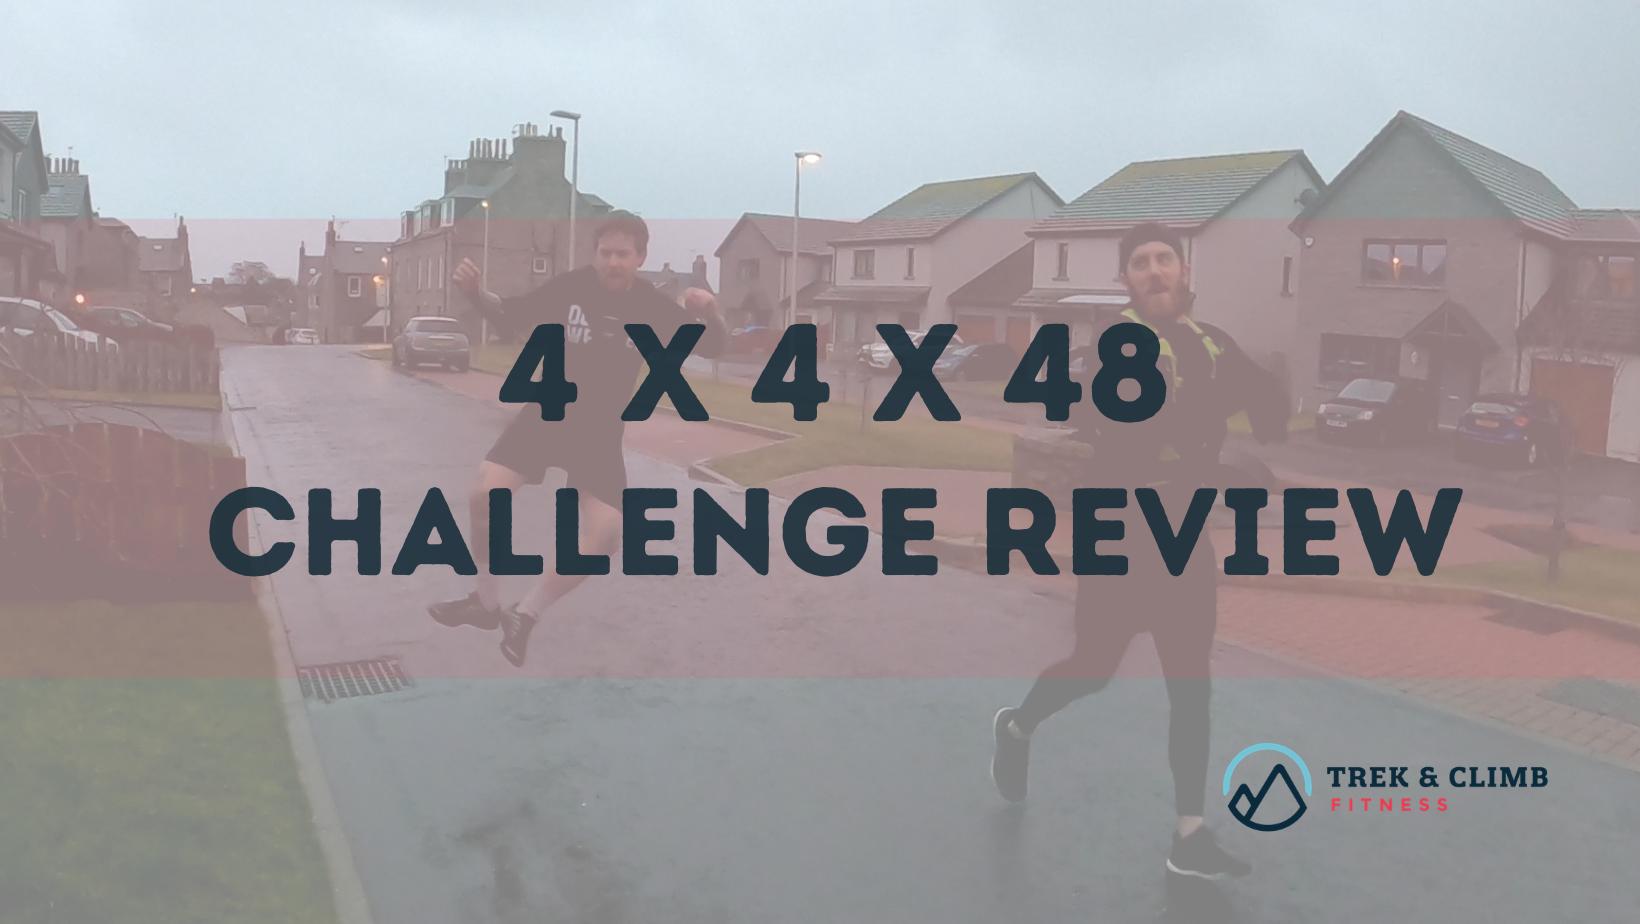 4 x 4 x 48 Challenge